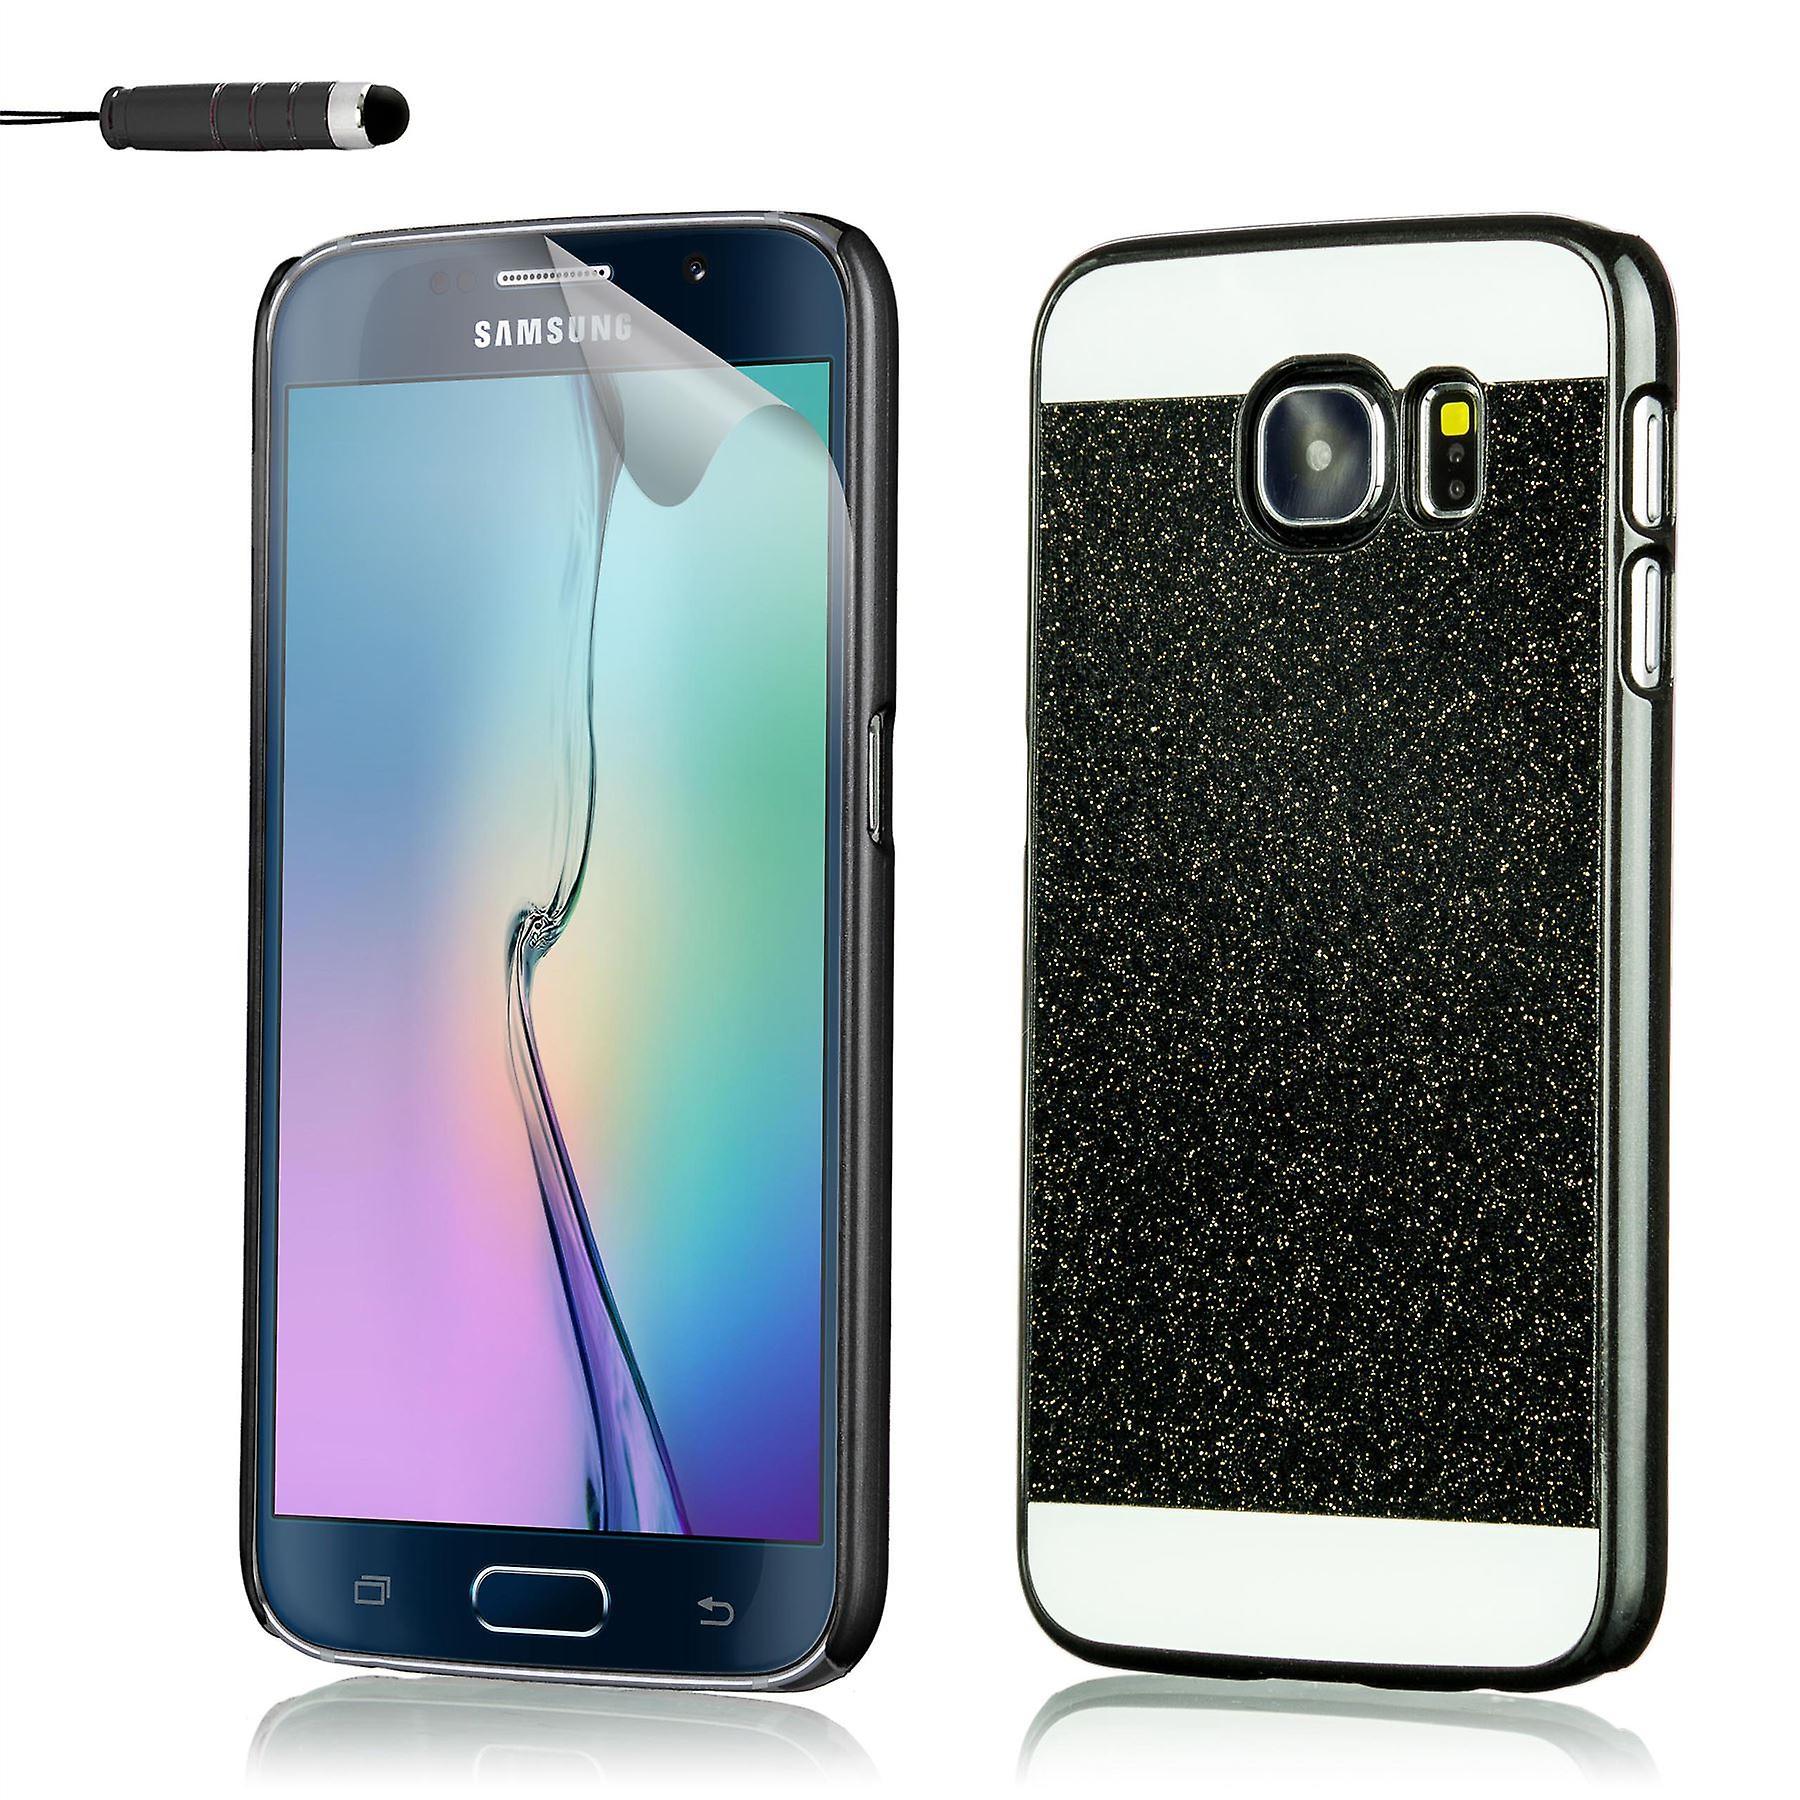 Glitter case for Samsung Galaxy S6 SM-G920 + stylus - Black